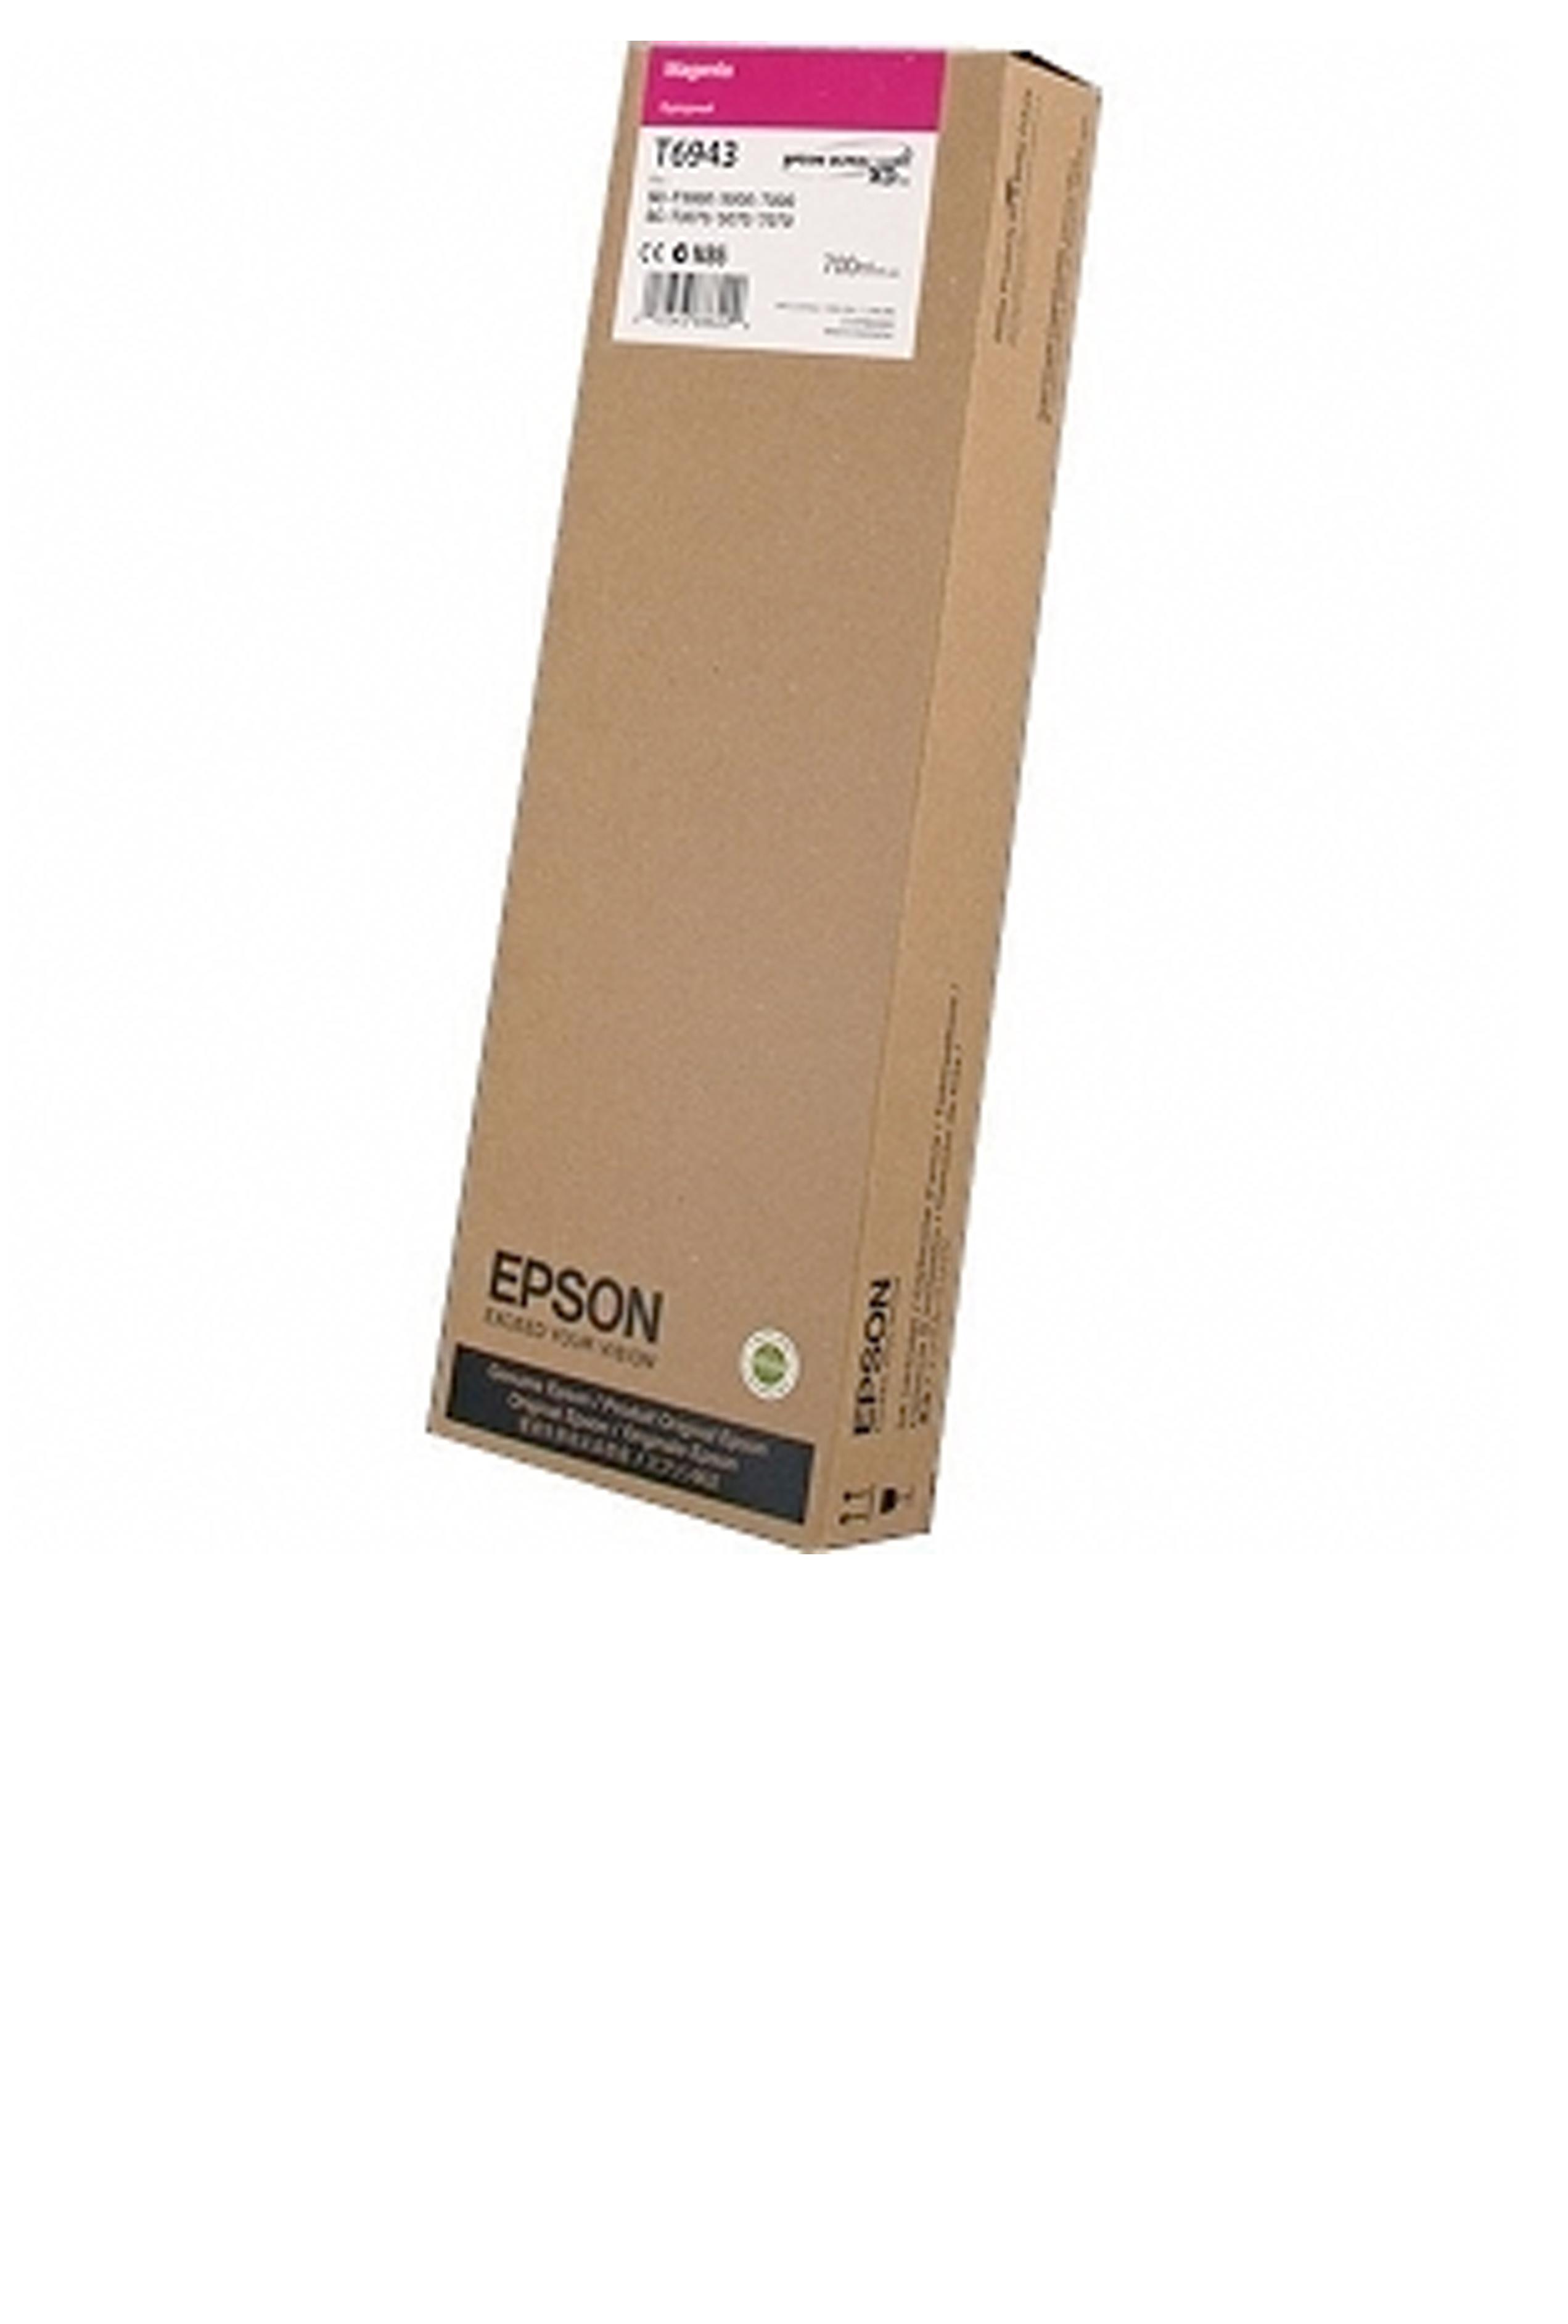 Epson EPSON HI MAGENTA INK (700 ML) (T694300)